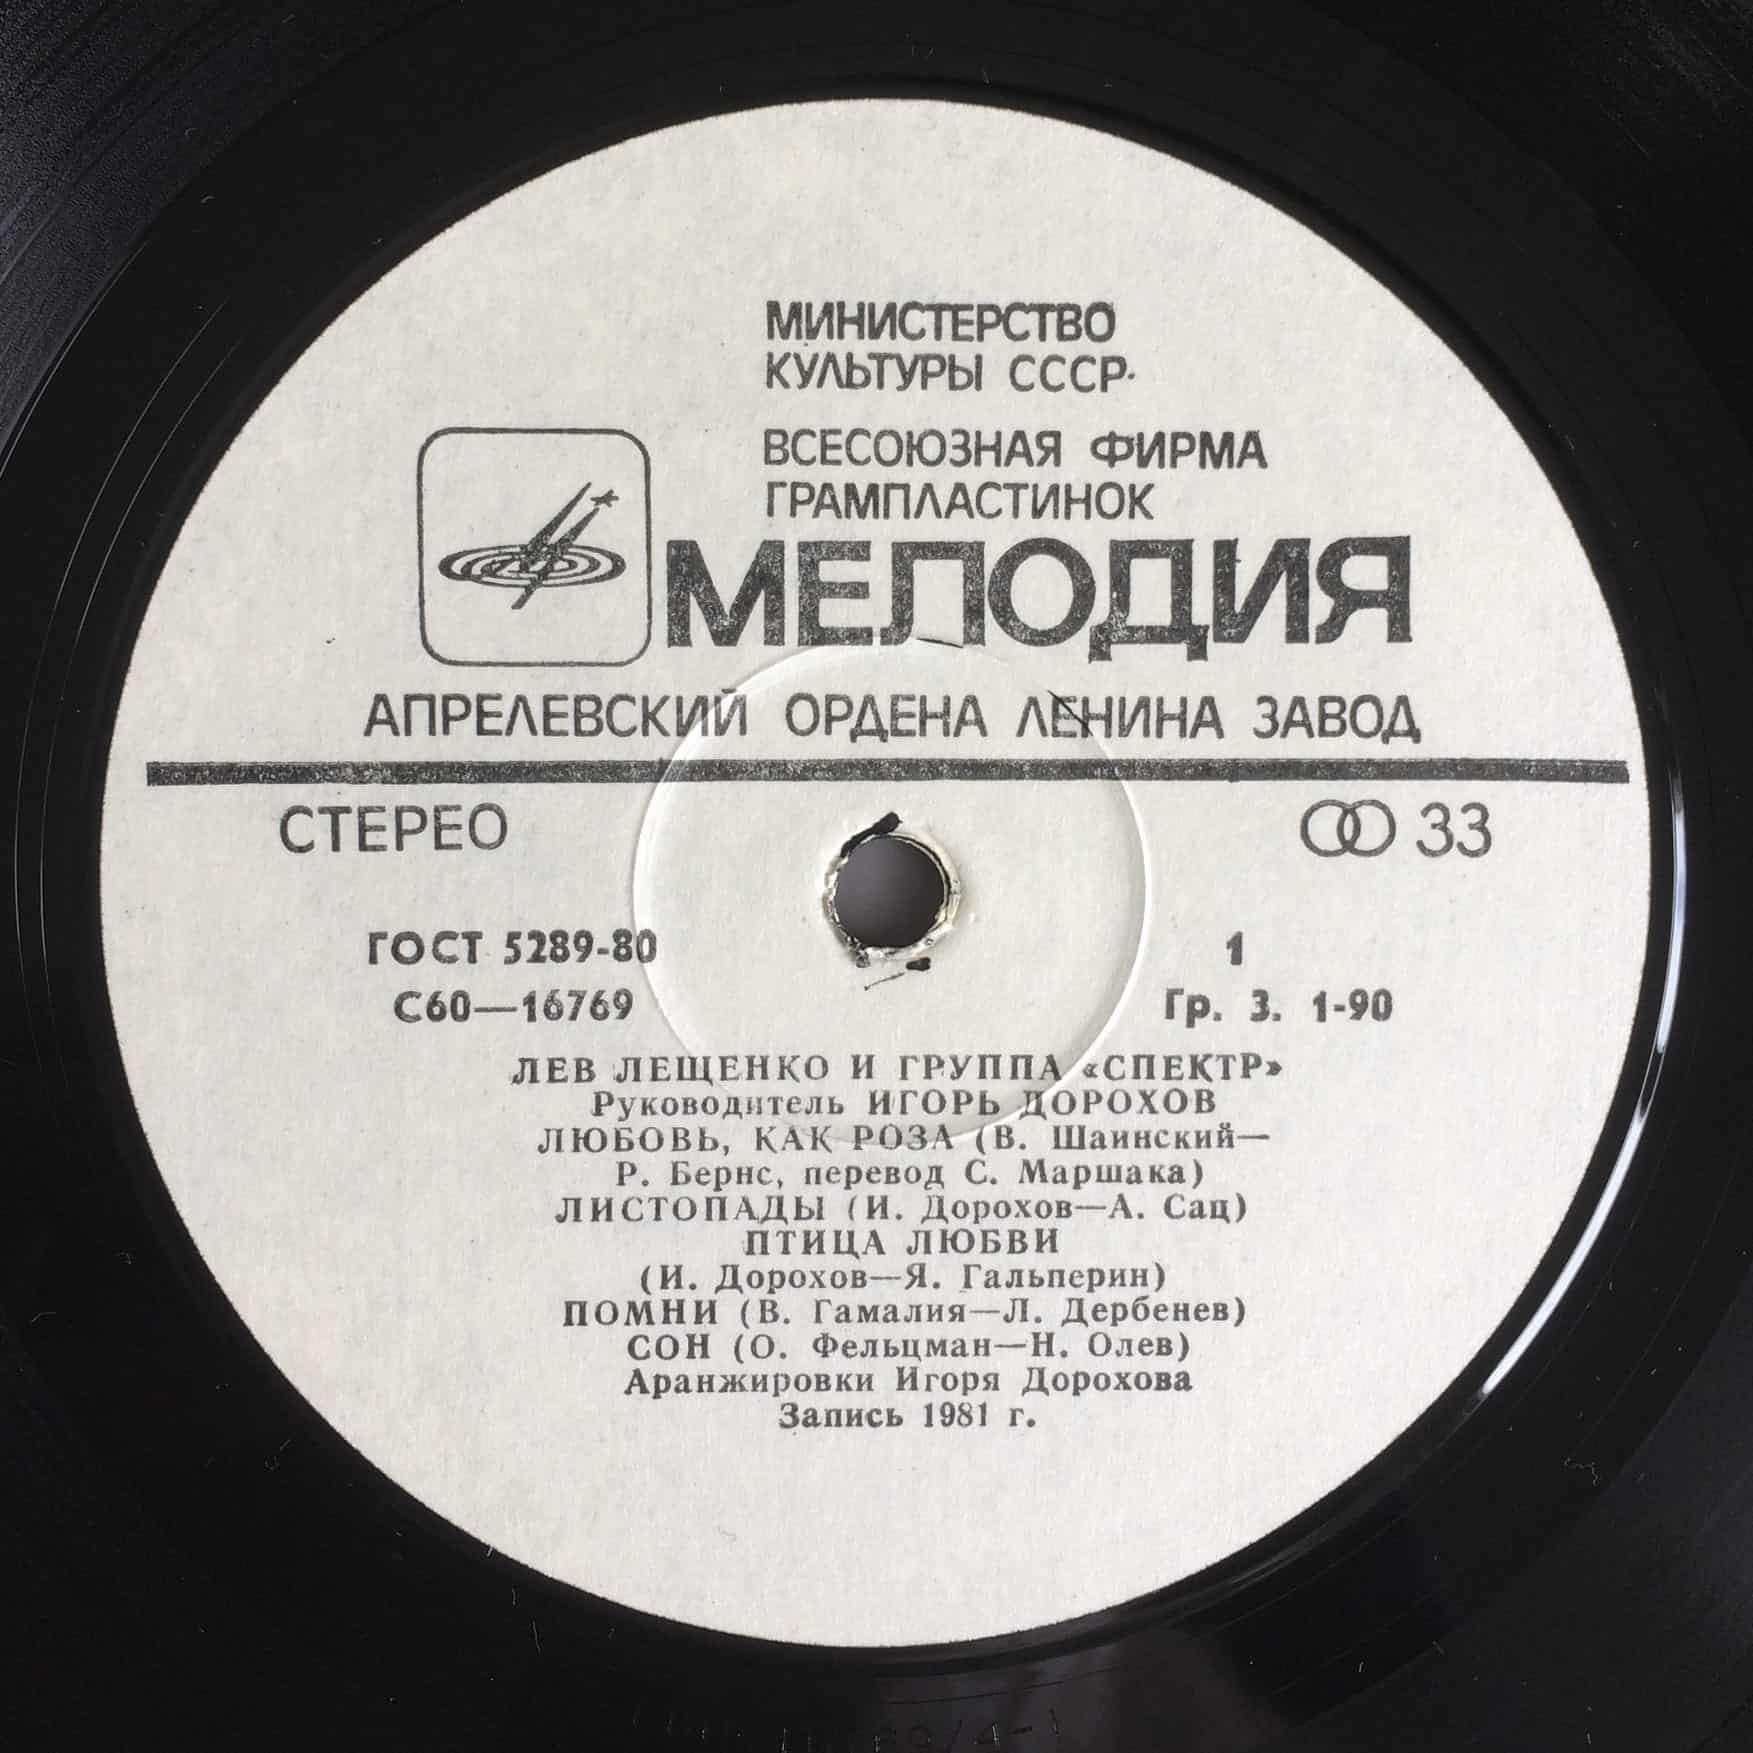 Lev Leshchenko and the «Spektr» Group – ЛЕВ ЛЕЩЕНКО И ГРУППА «СПЕКТР»